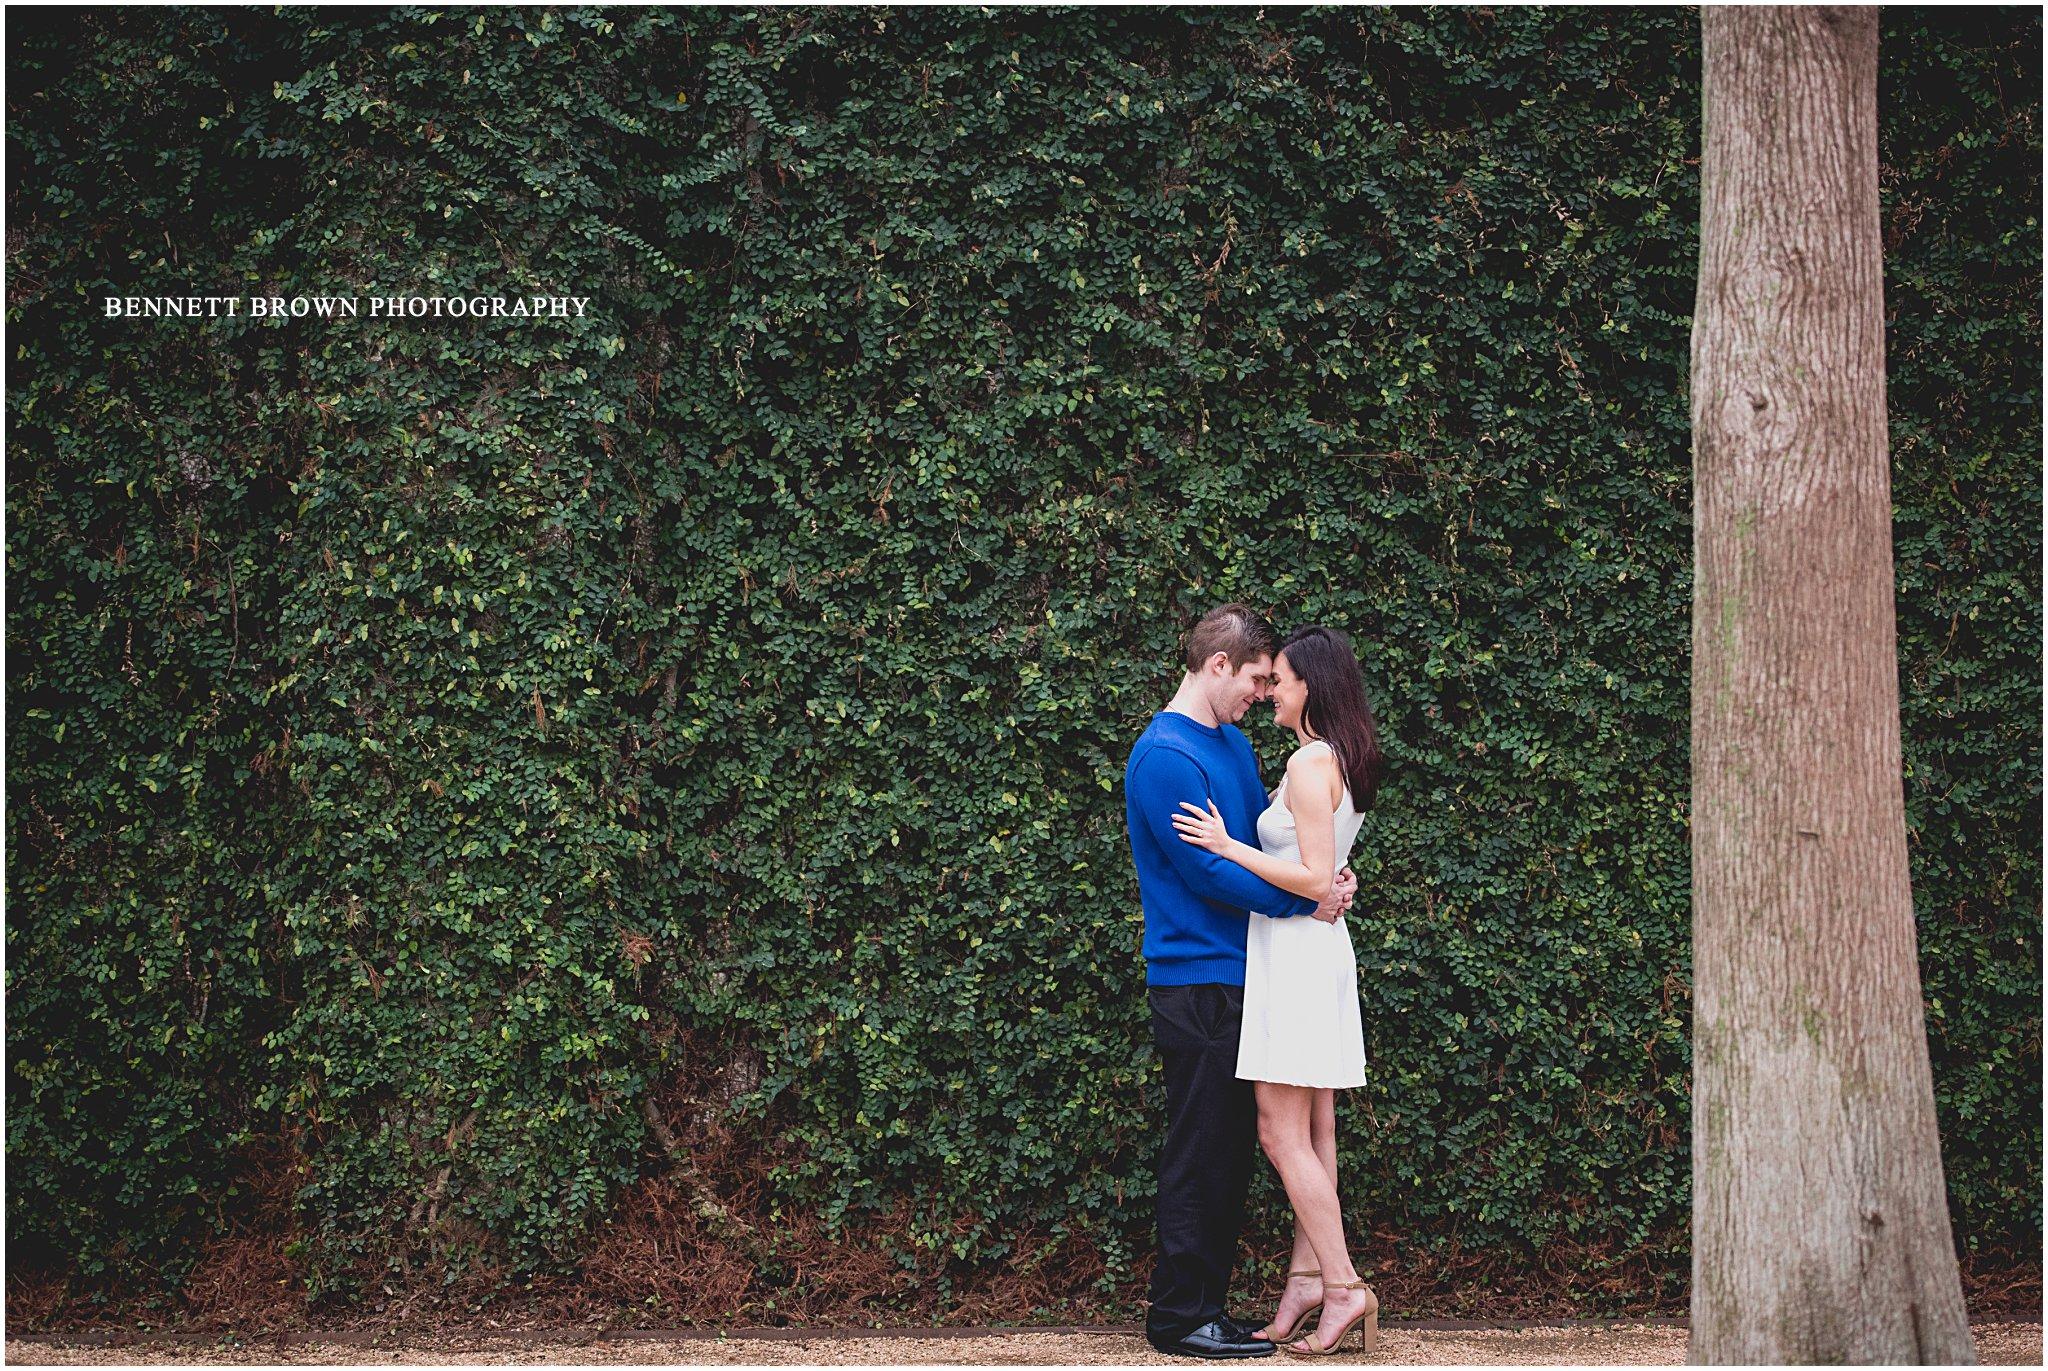 Bennett Brown Photography Detail shoot Wedding photographer Houston Texas Engagement Ivy